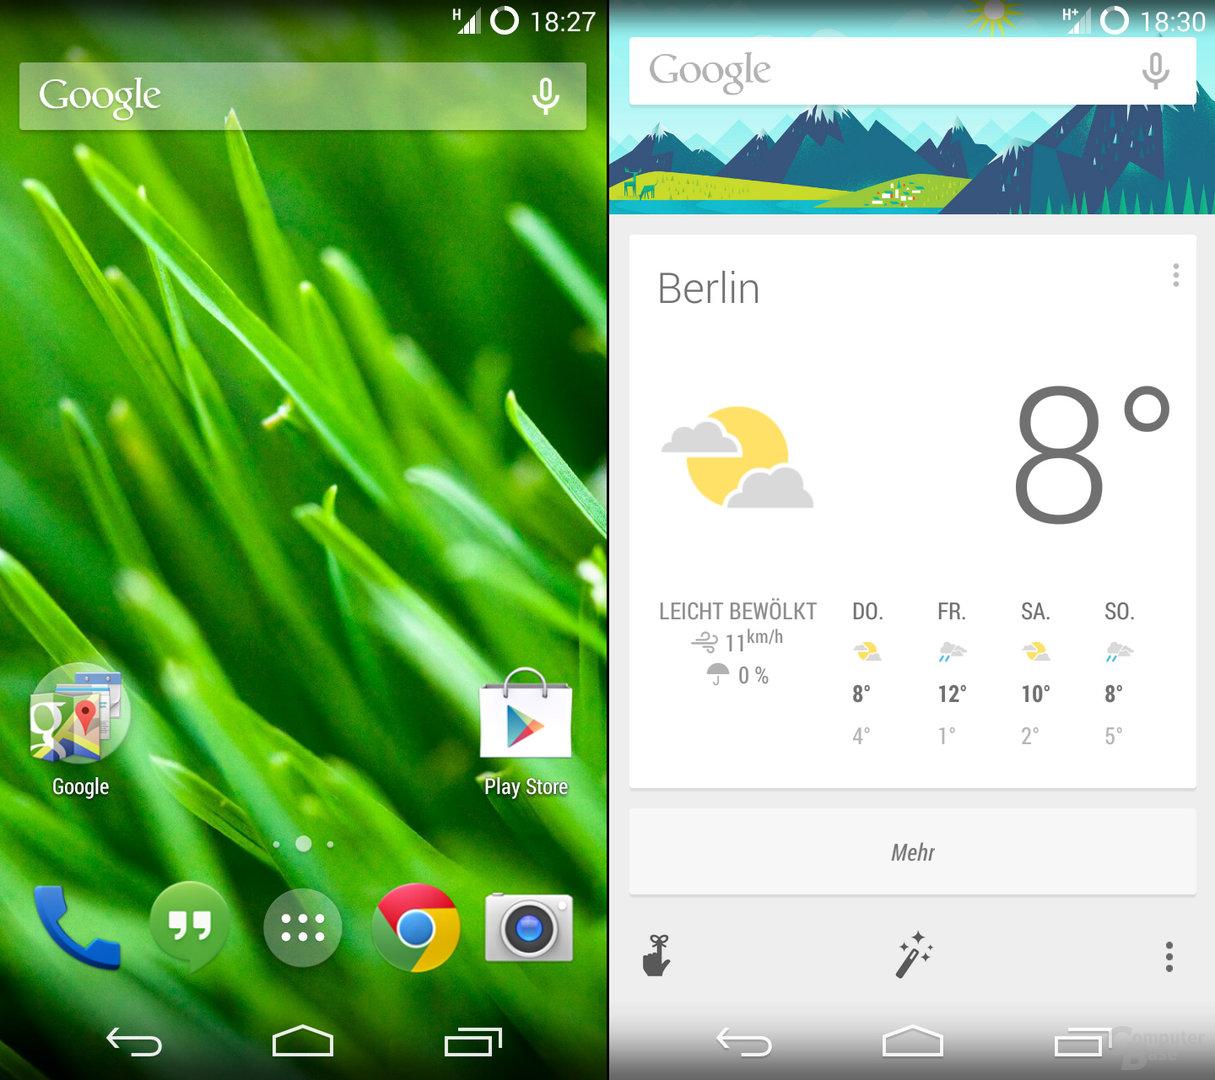 Google Now & Google Now Launcher